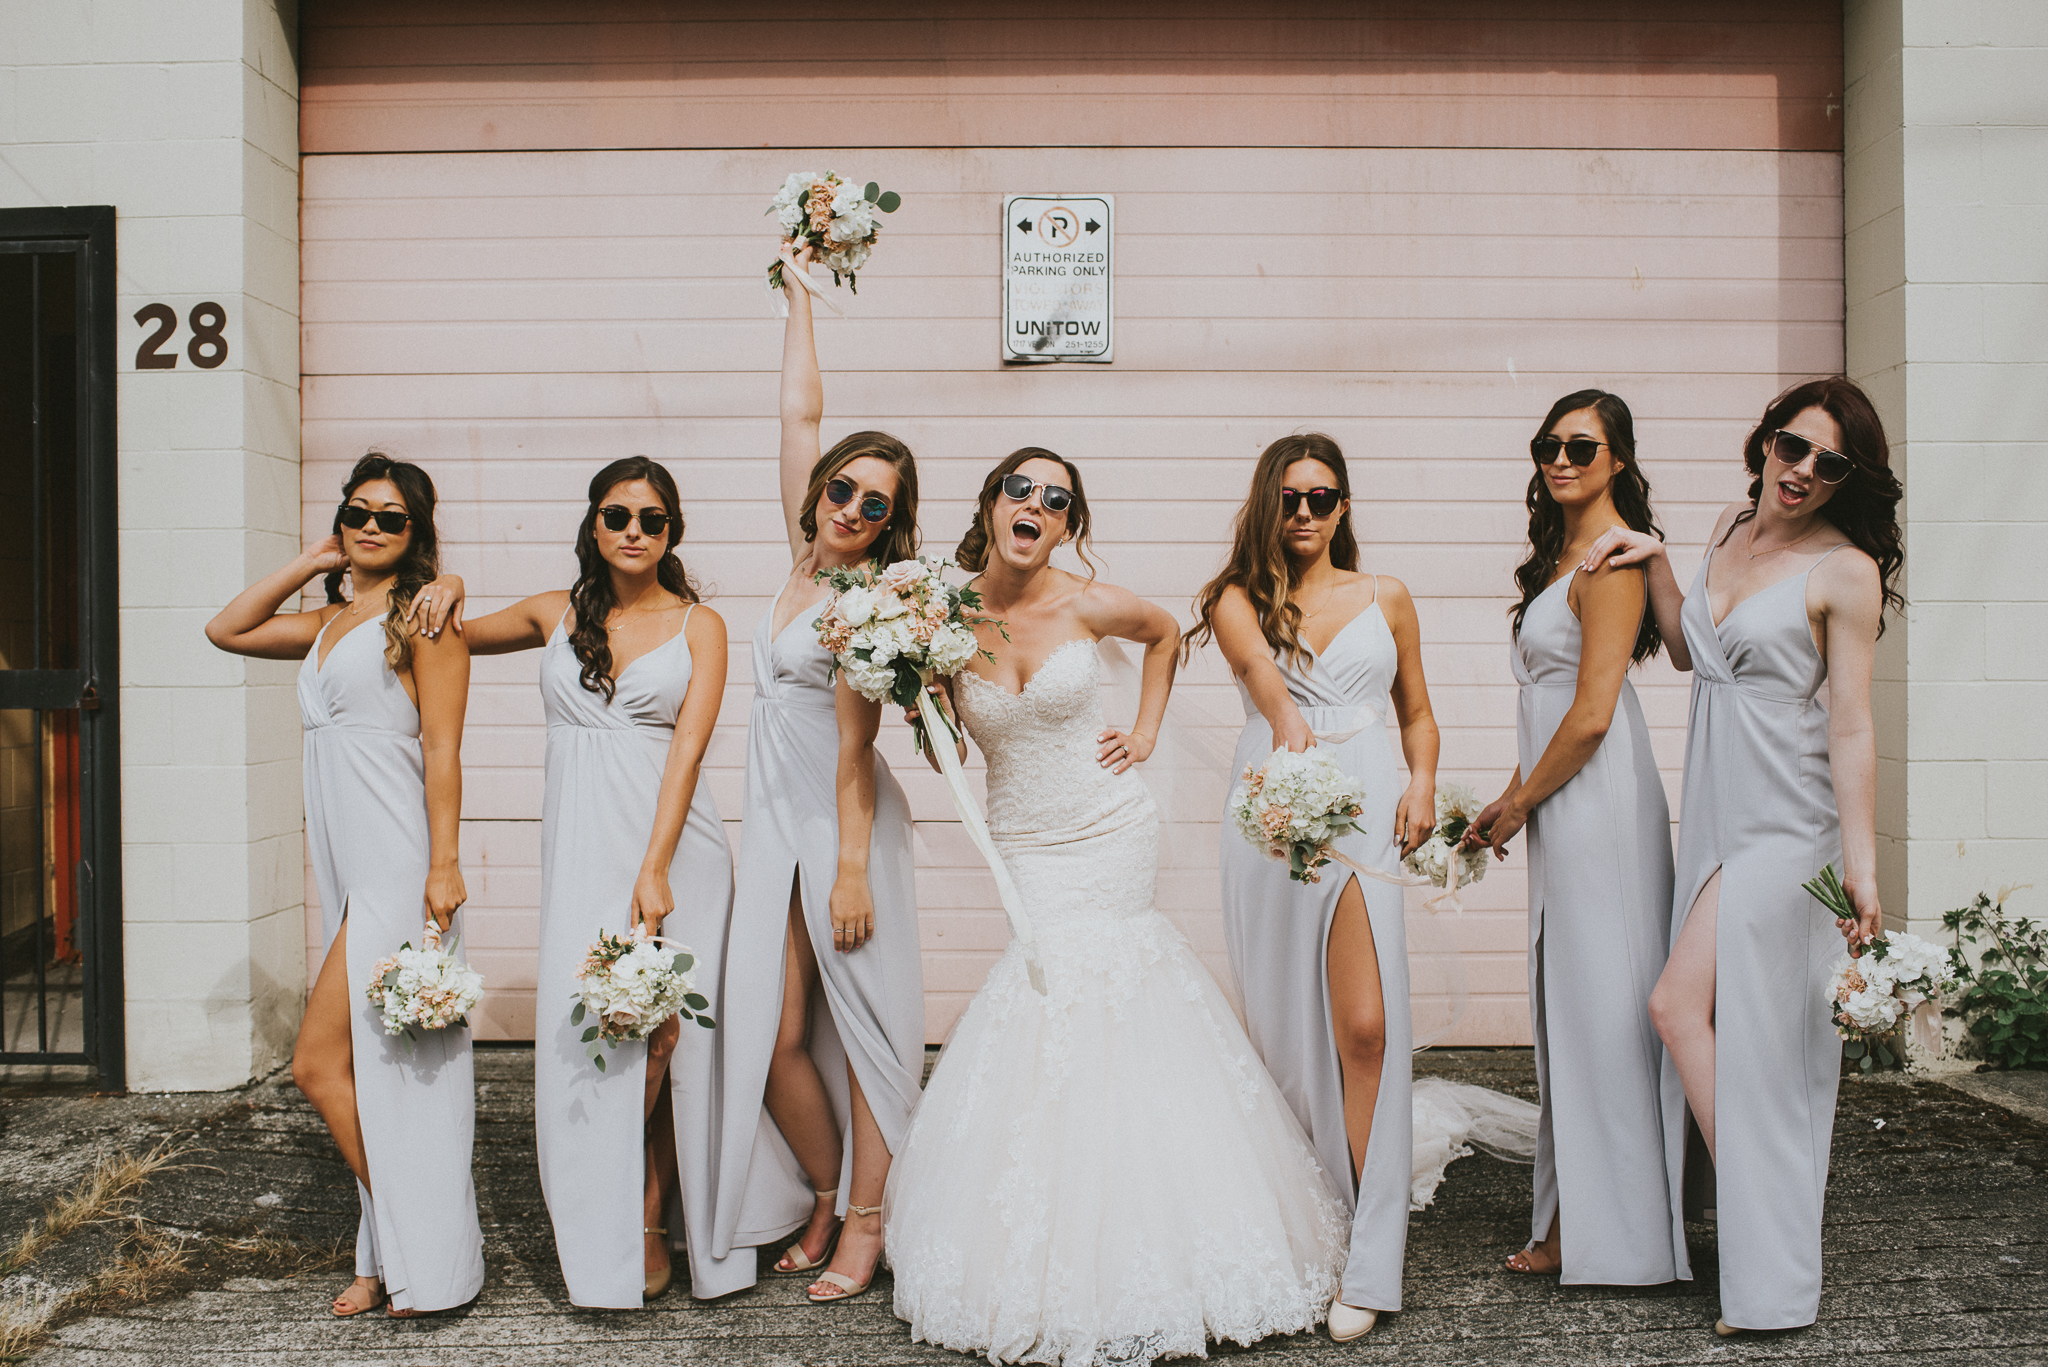 49-permanent-vancouver-wedding-courtneysteven-web-8240.jpg